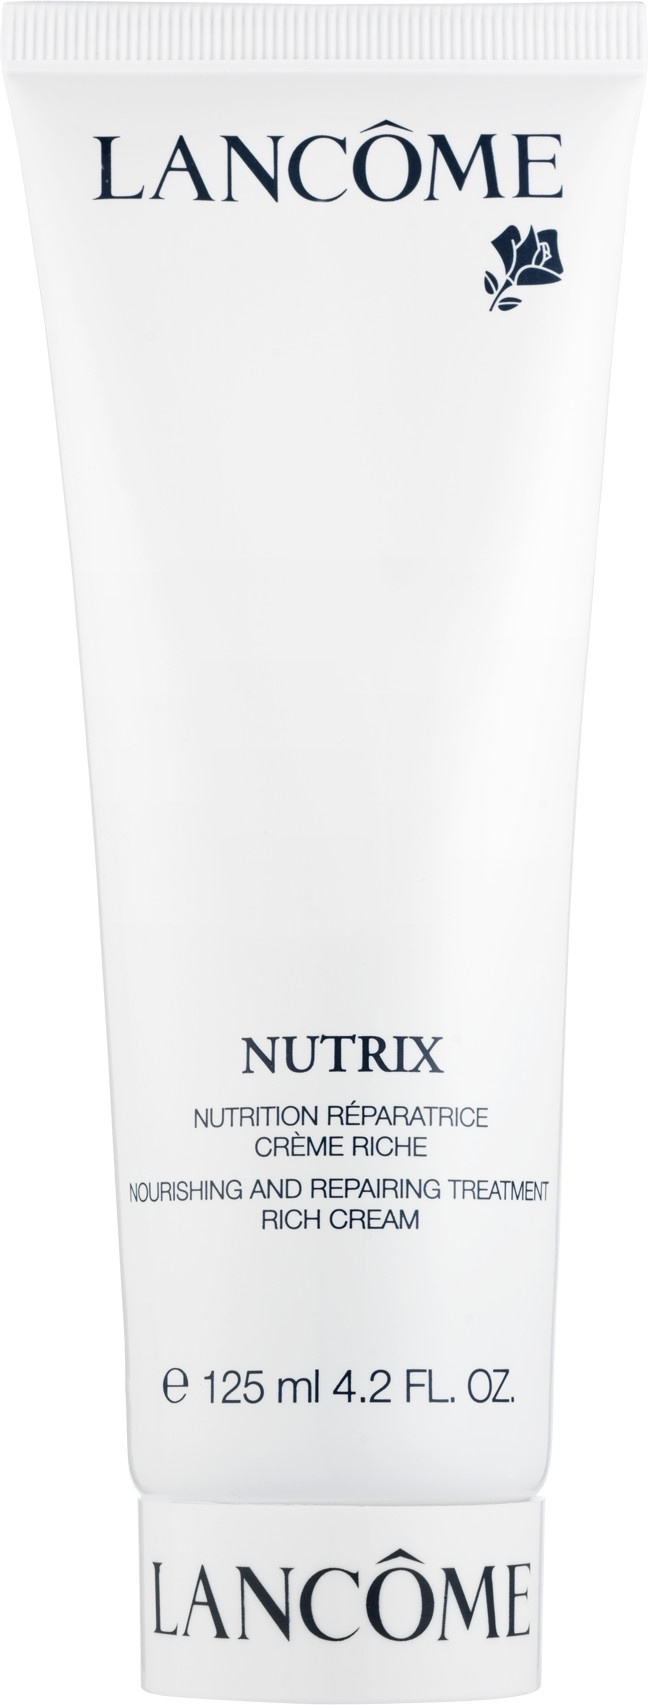 Lancôme Nutrix Nourishing And Soothing Rich Cream